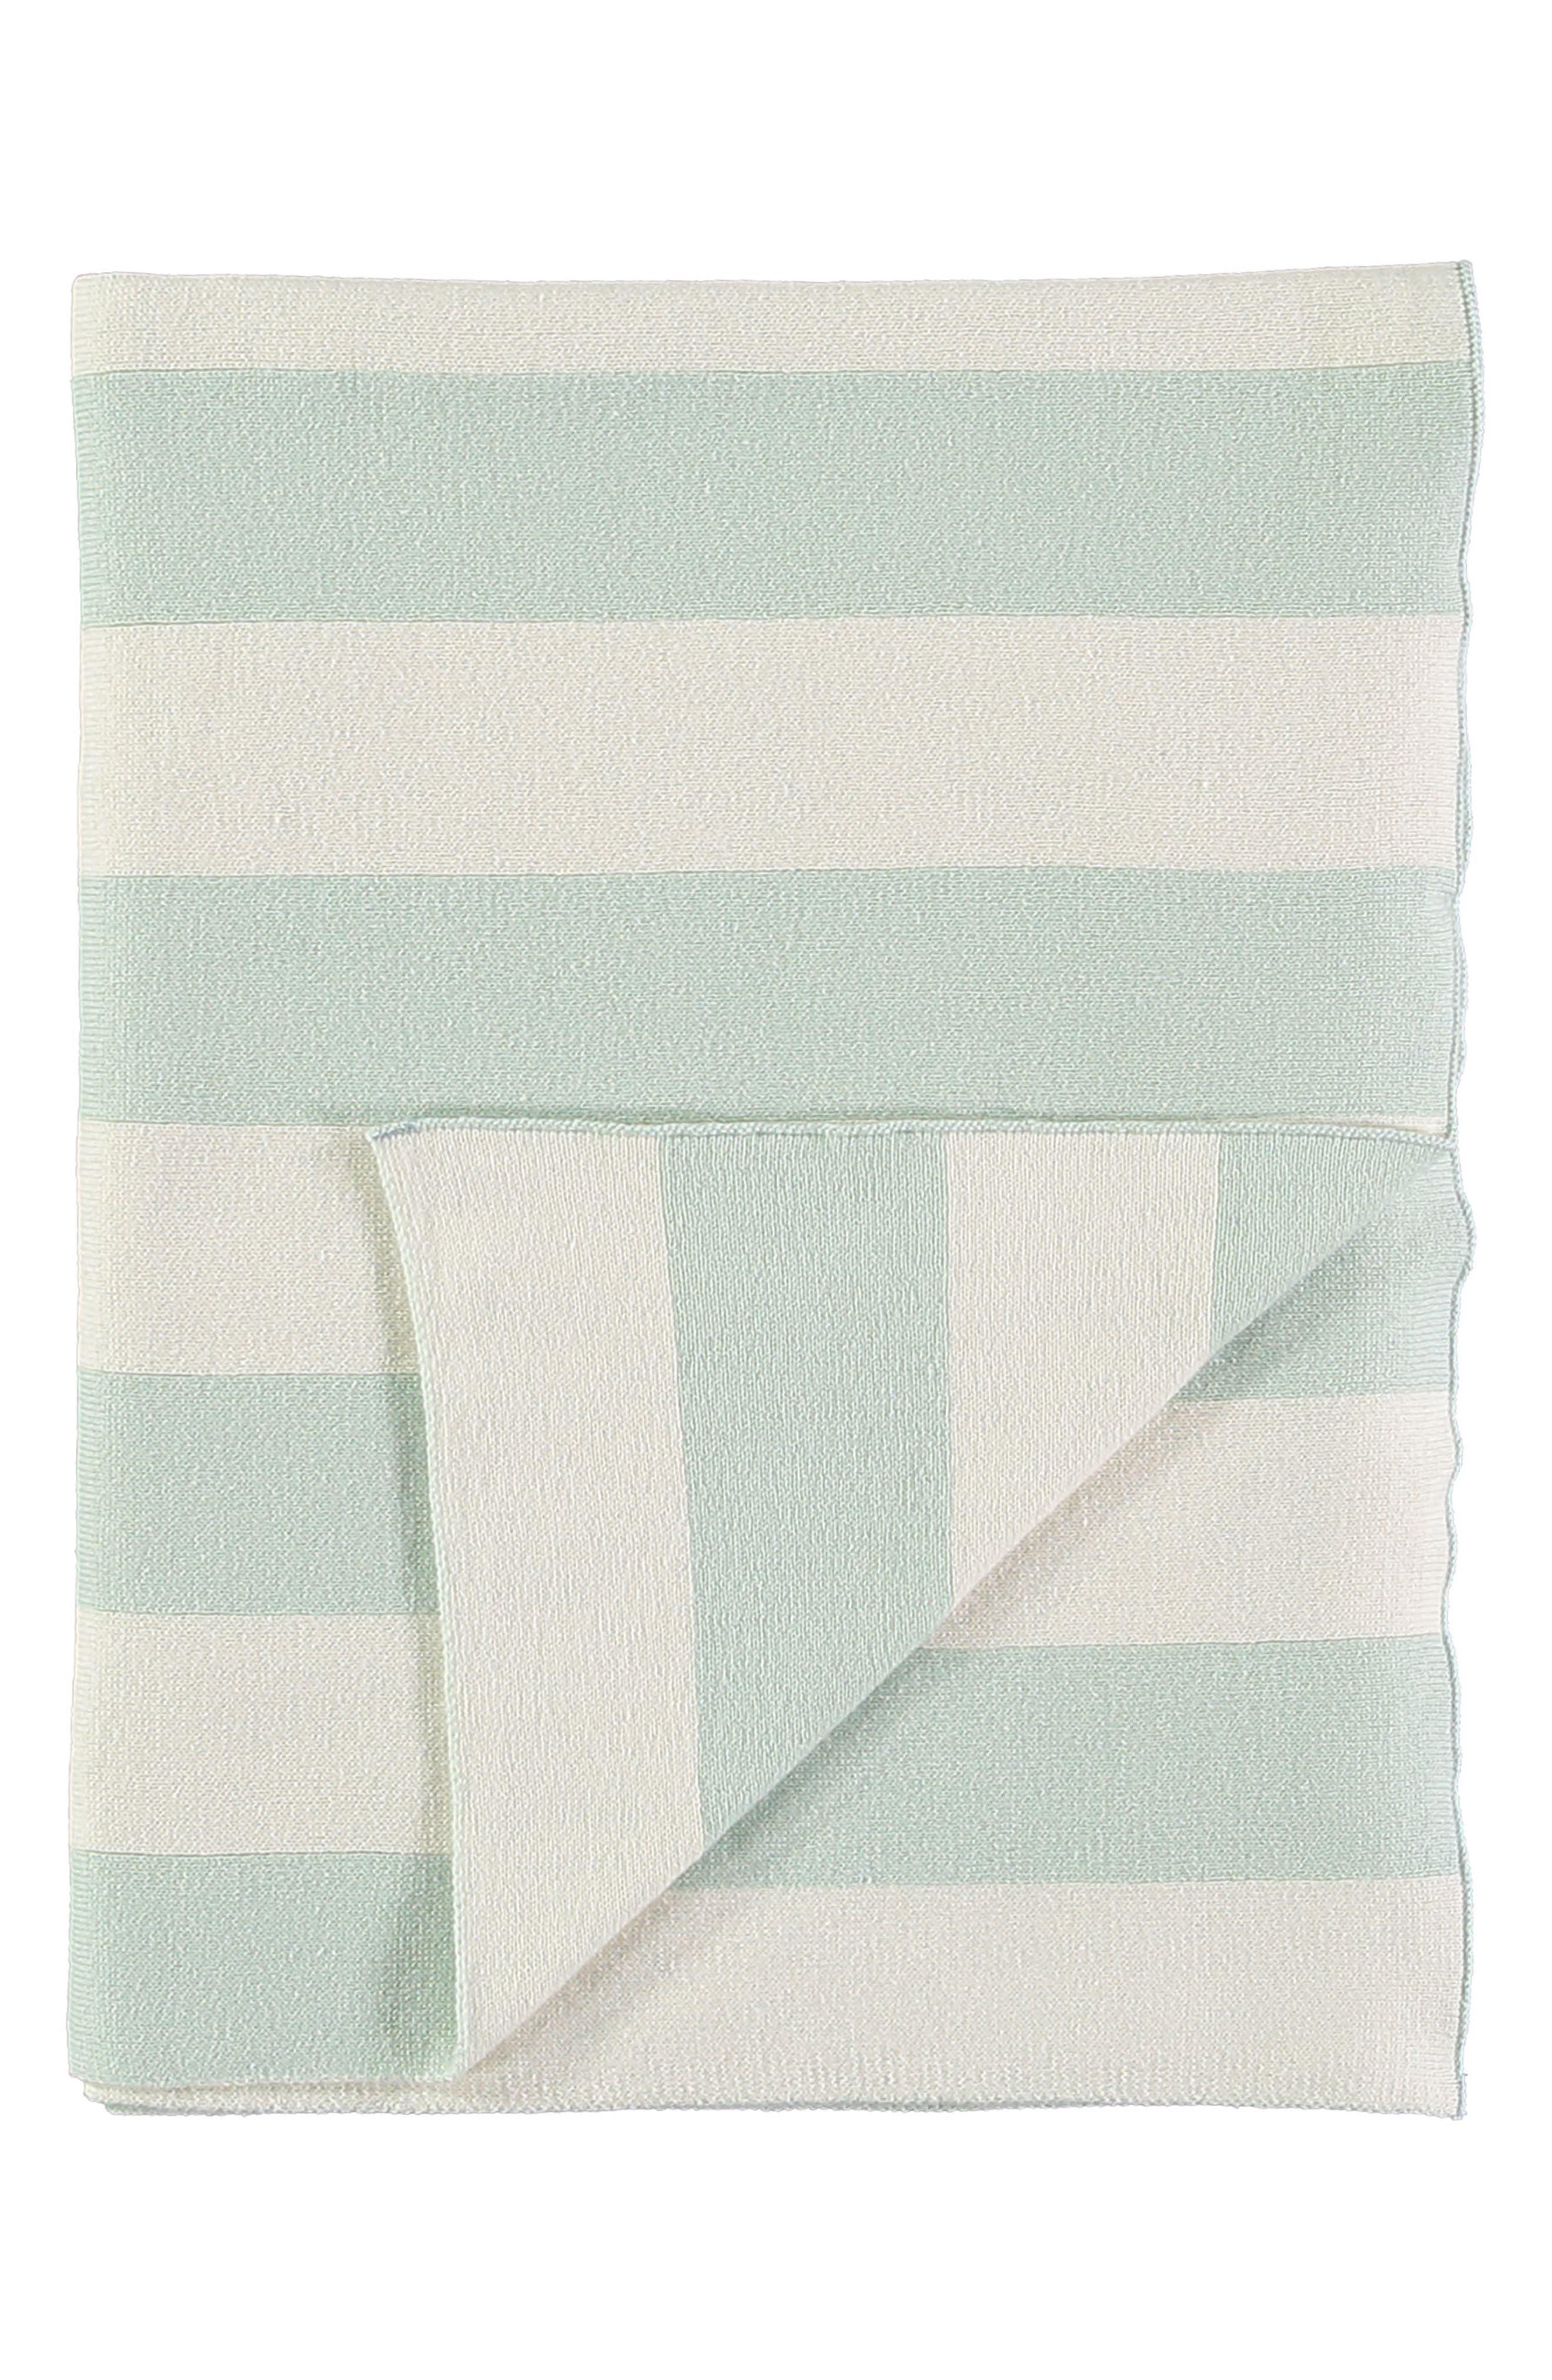 Organic Cotton Knit Blanket,                         Main,                         color, MINT